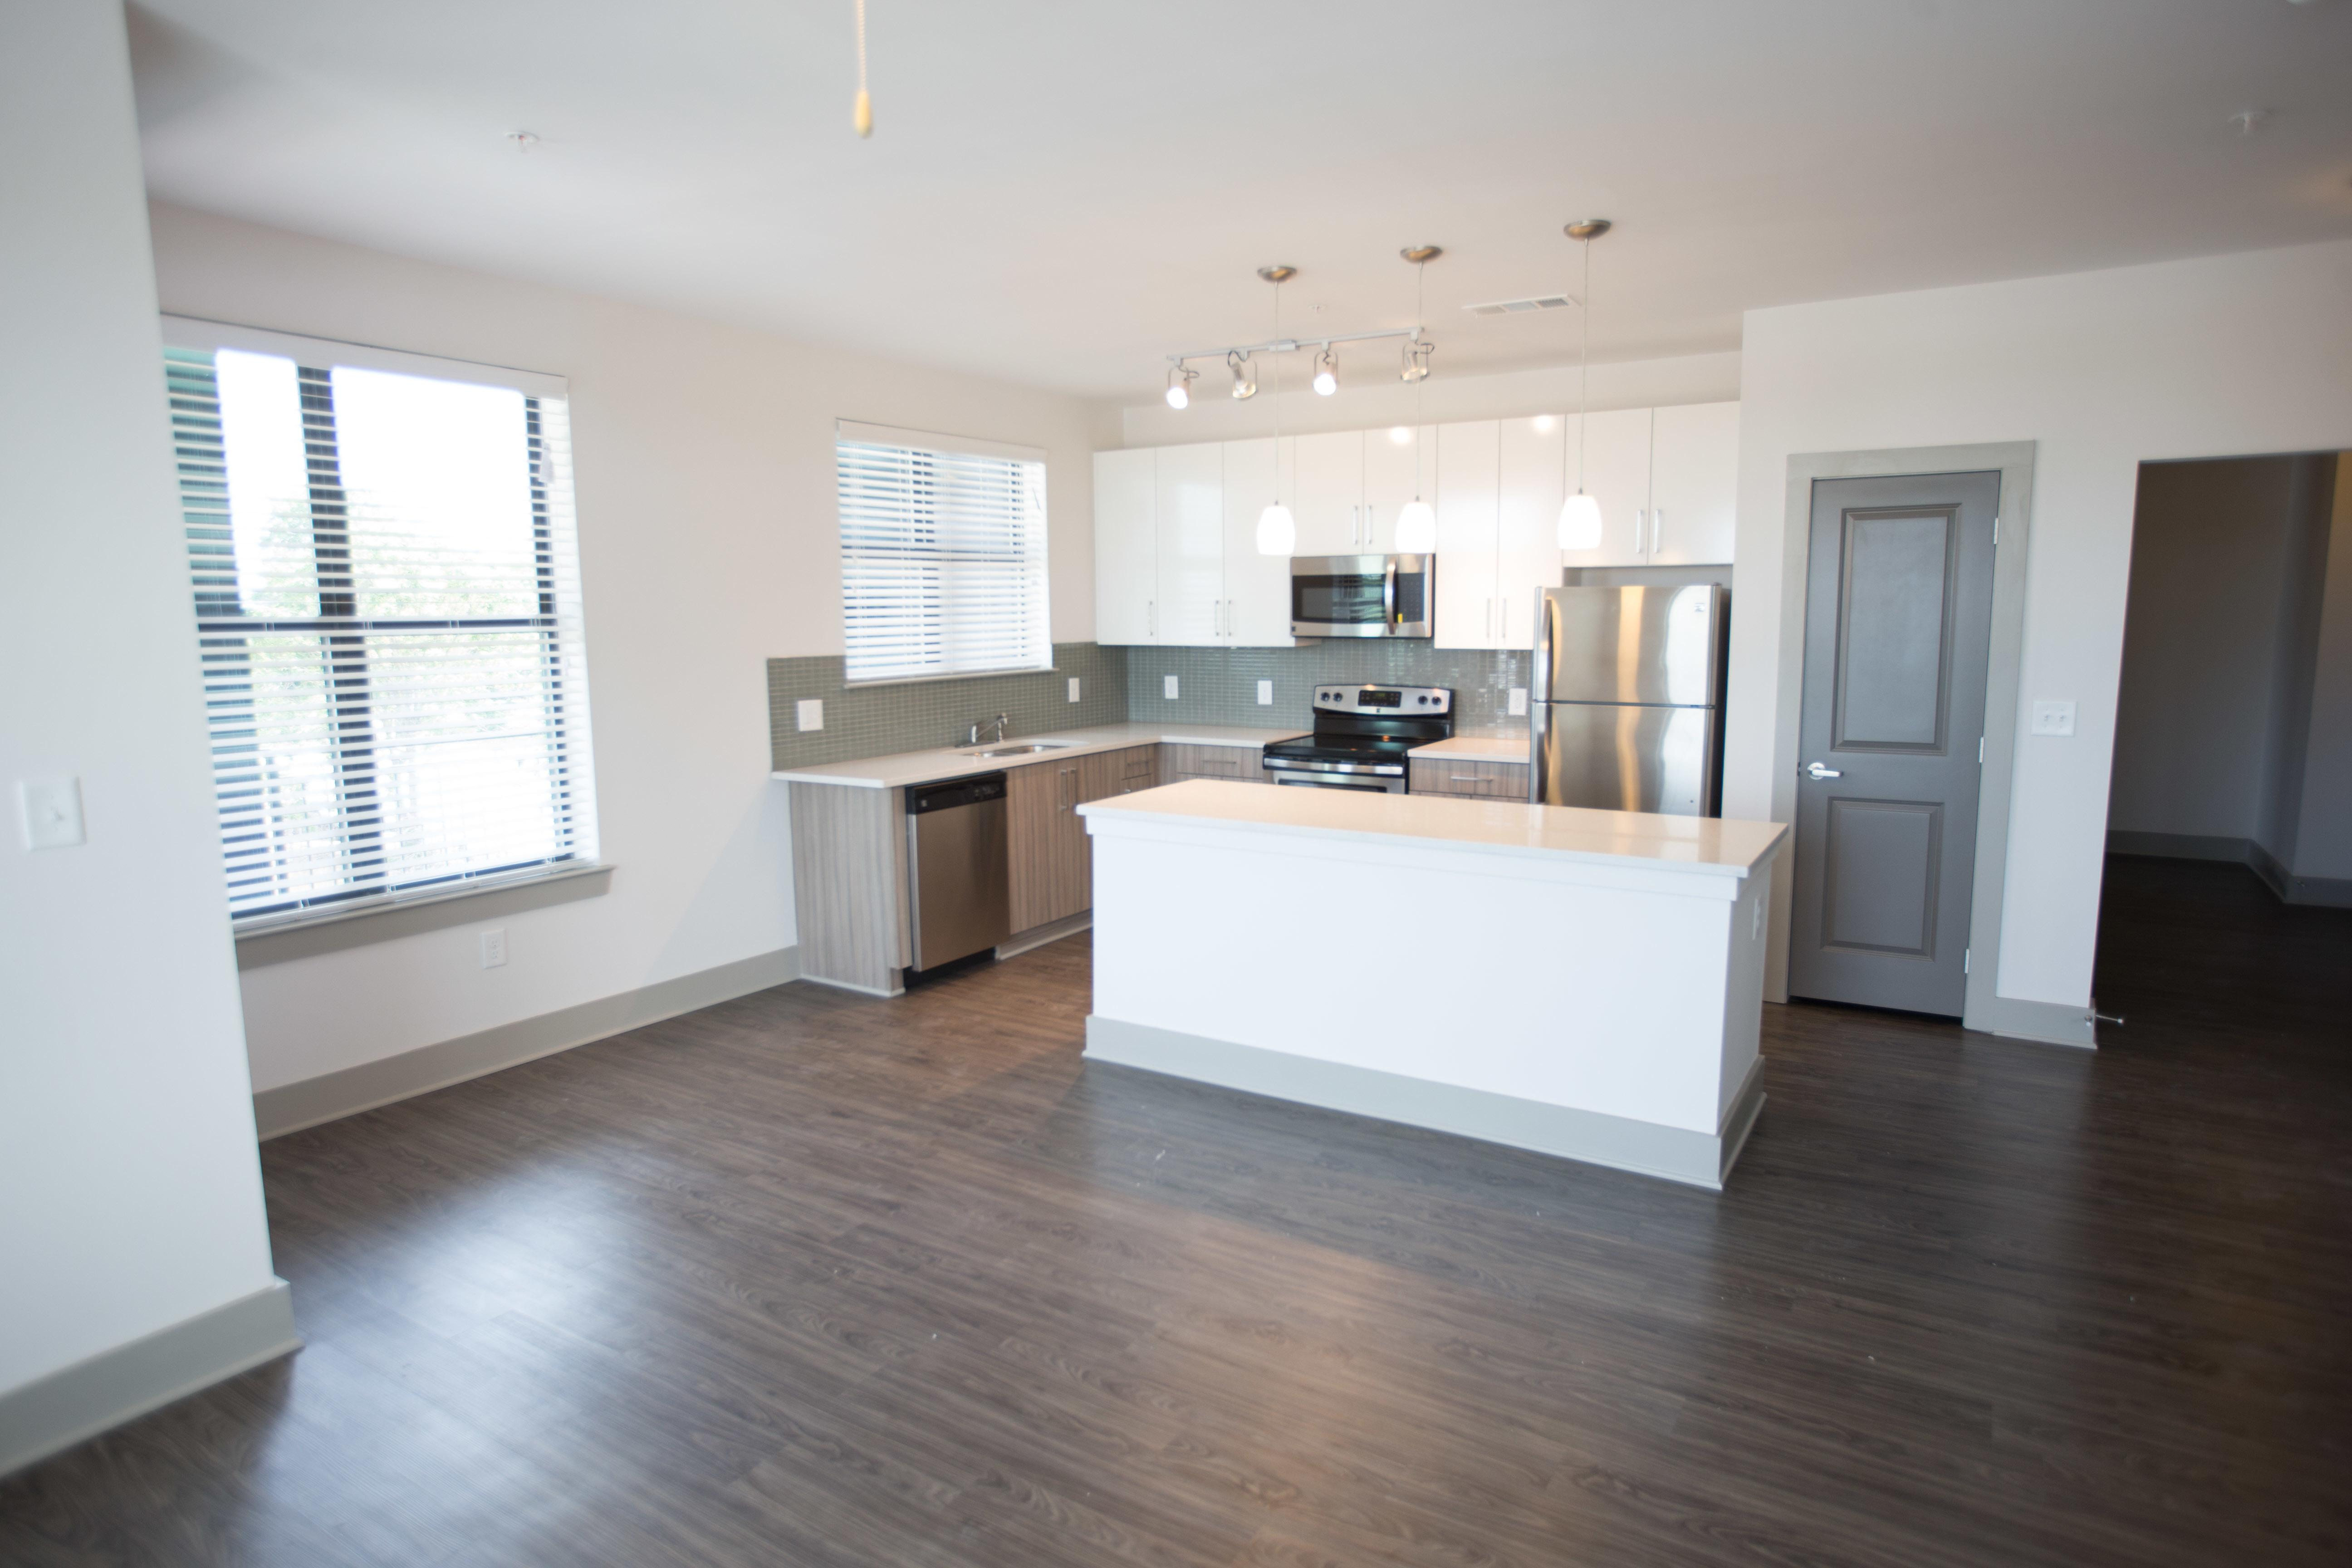 Miraculous Amli Lindbergh | Mesmerizing Luxury Apartments Buckhead Atlanta Inspiration